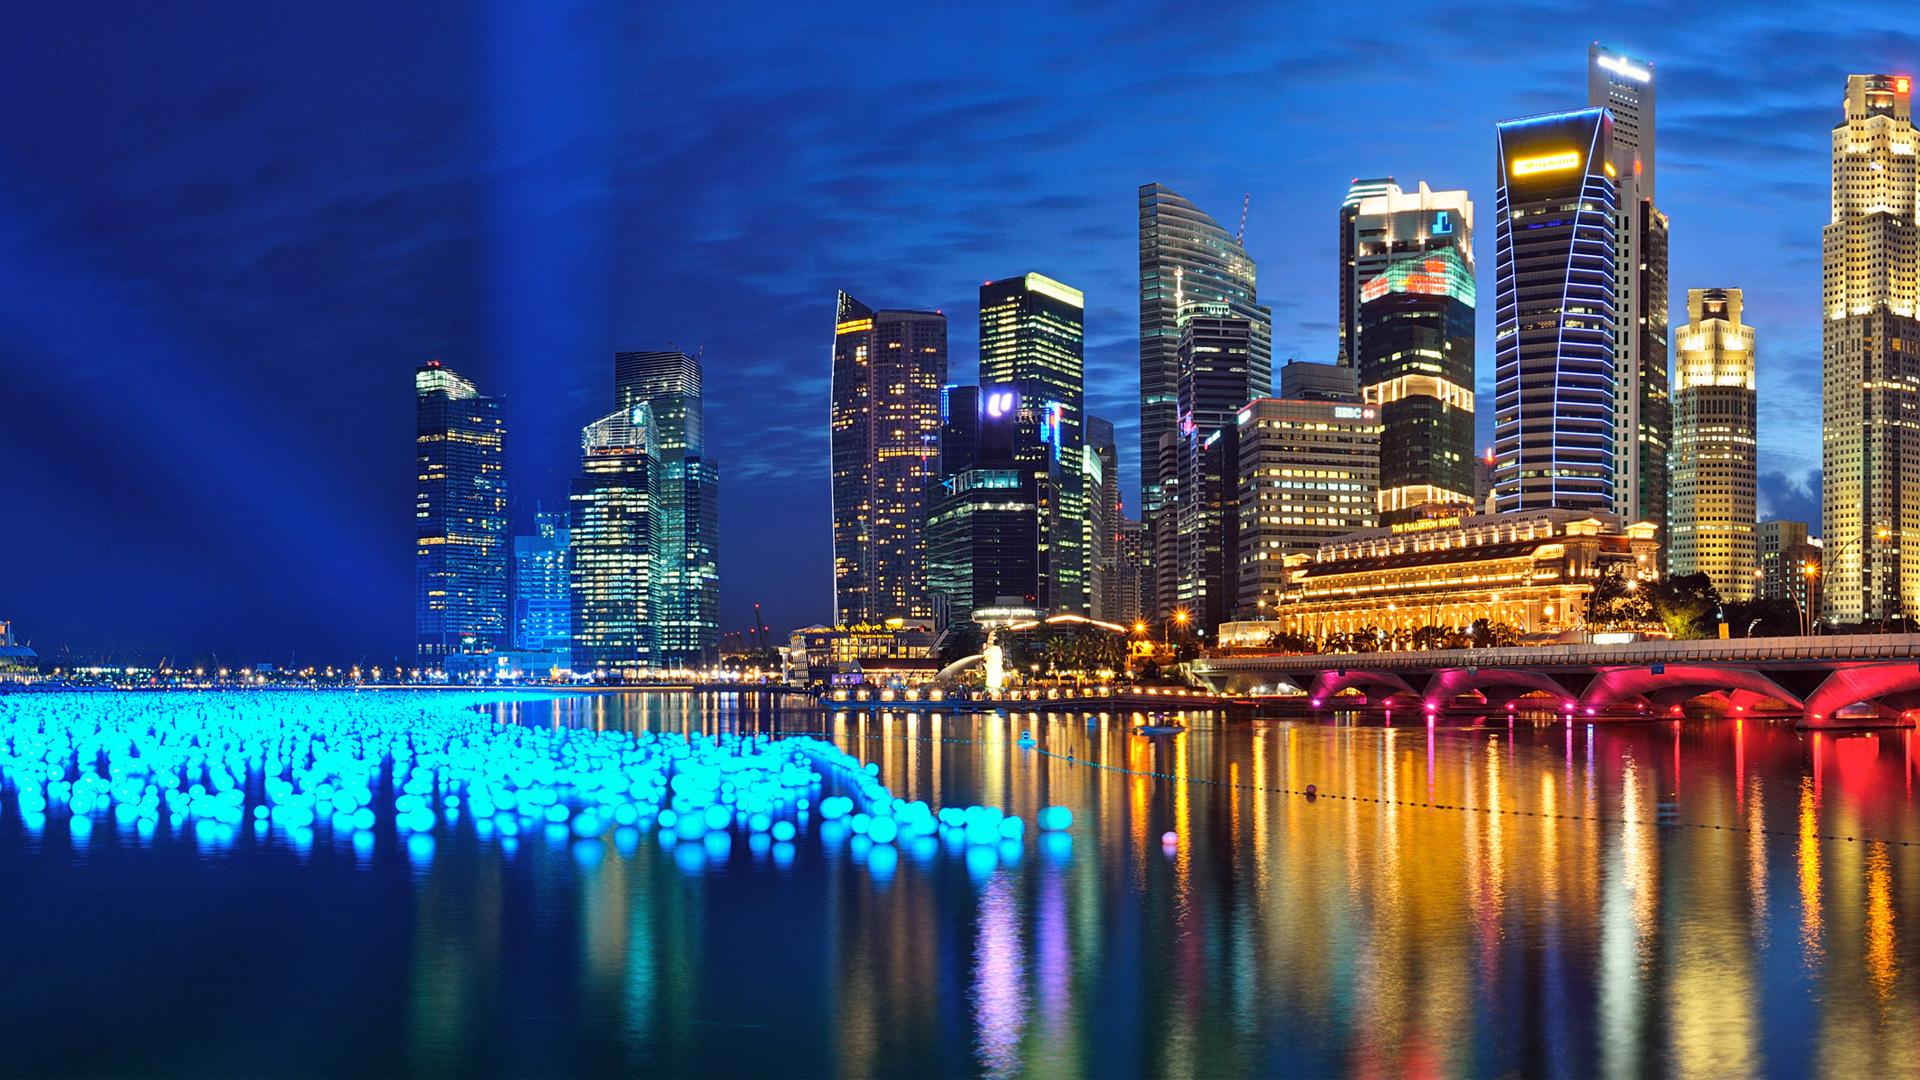 singapor nightlife image